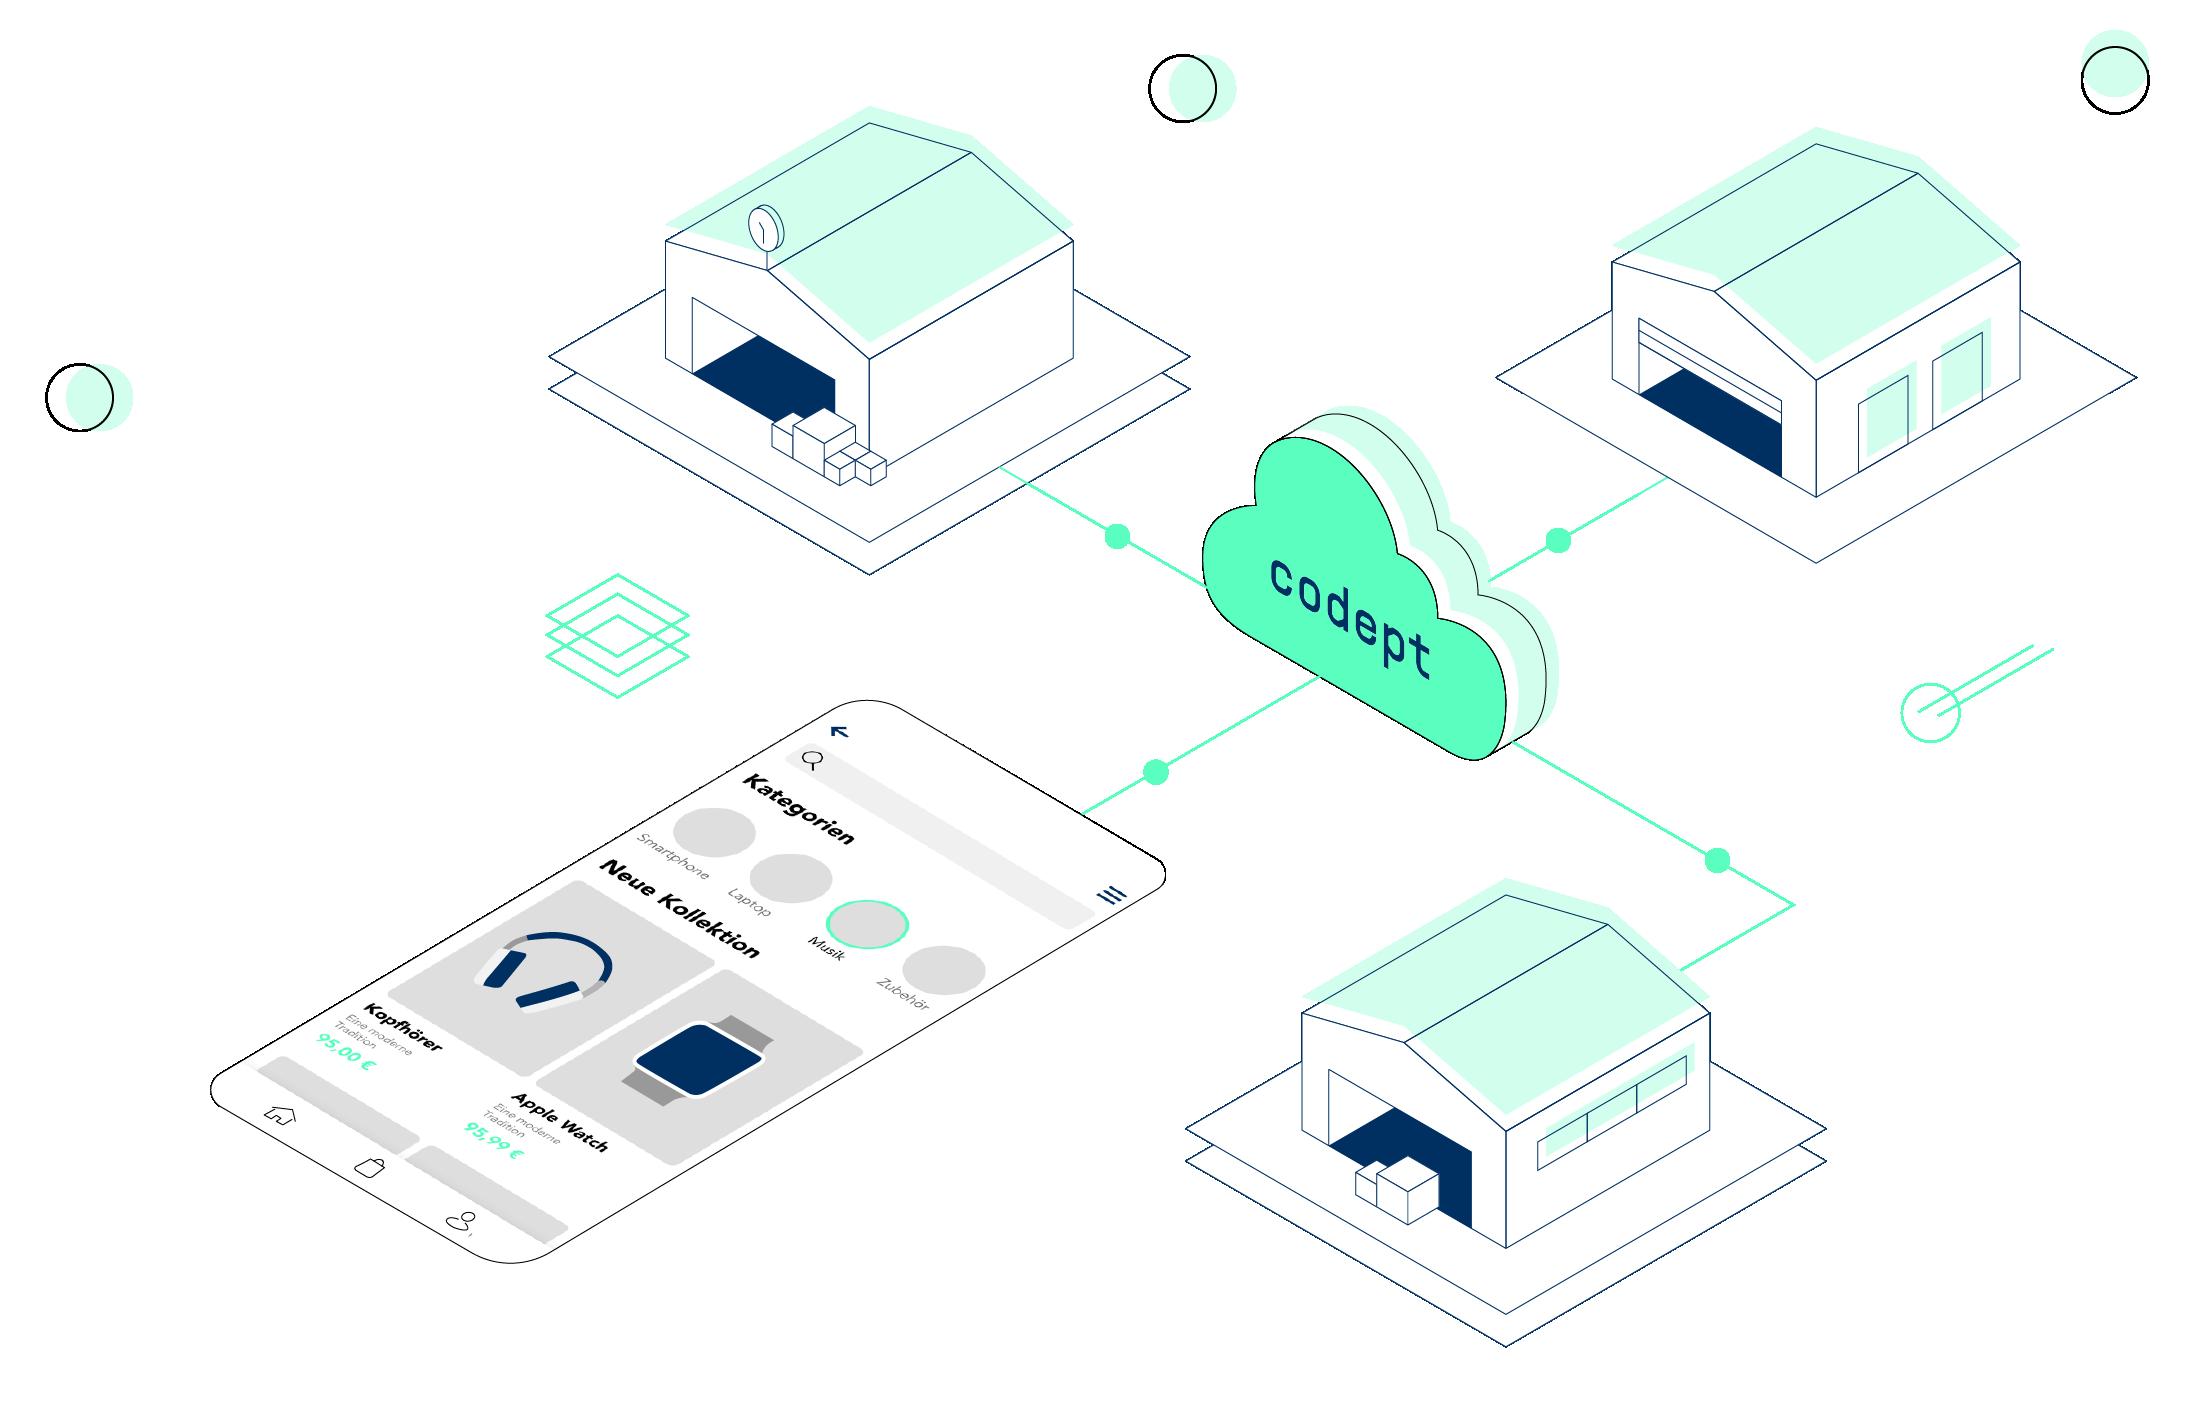 Logistik und e-commerce verbinden, fulfillment, lagerstandorte